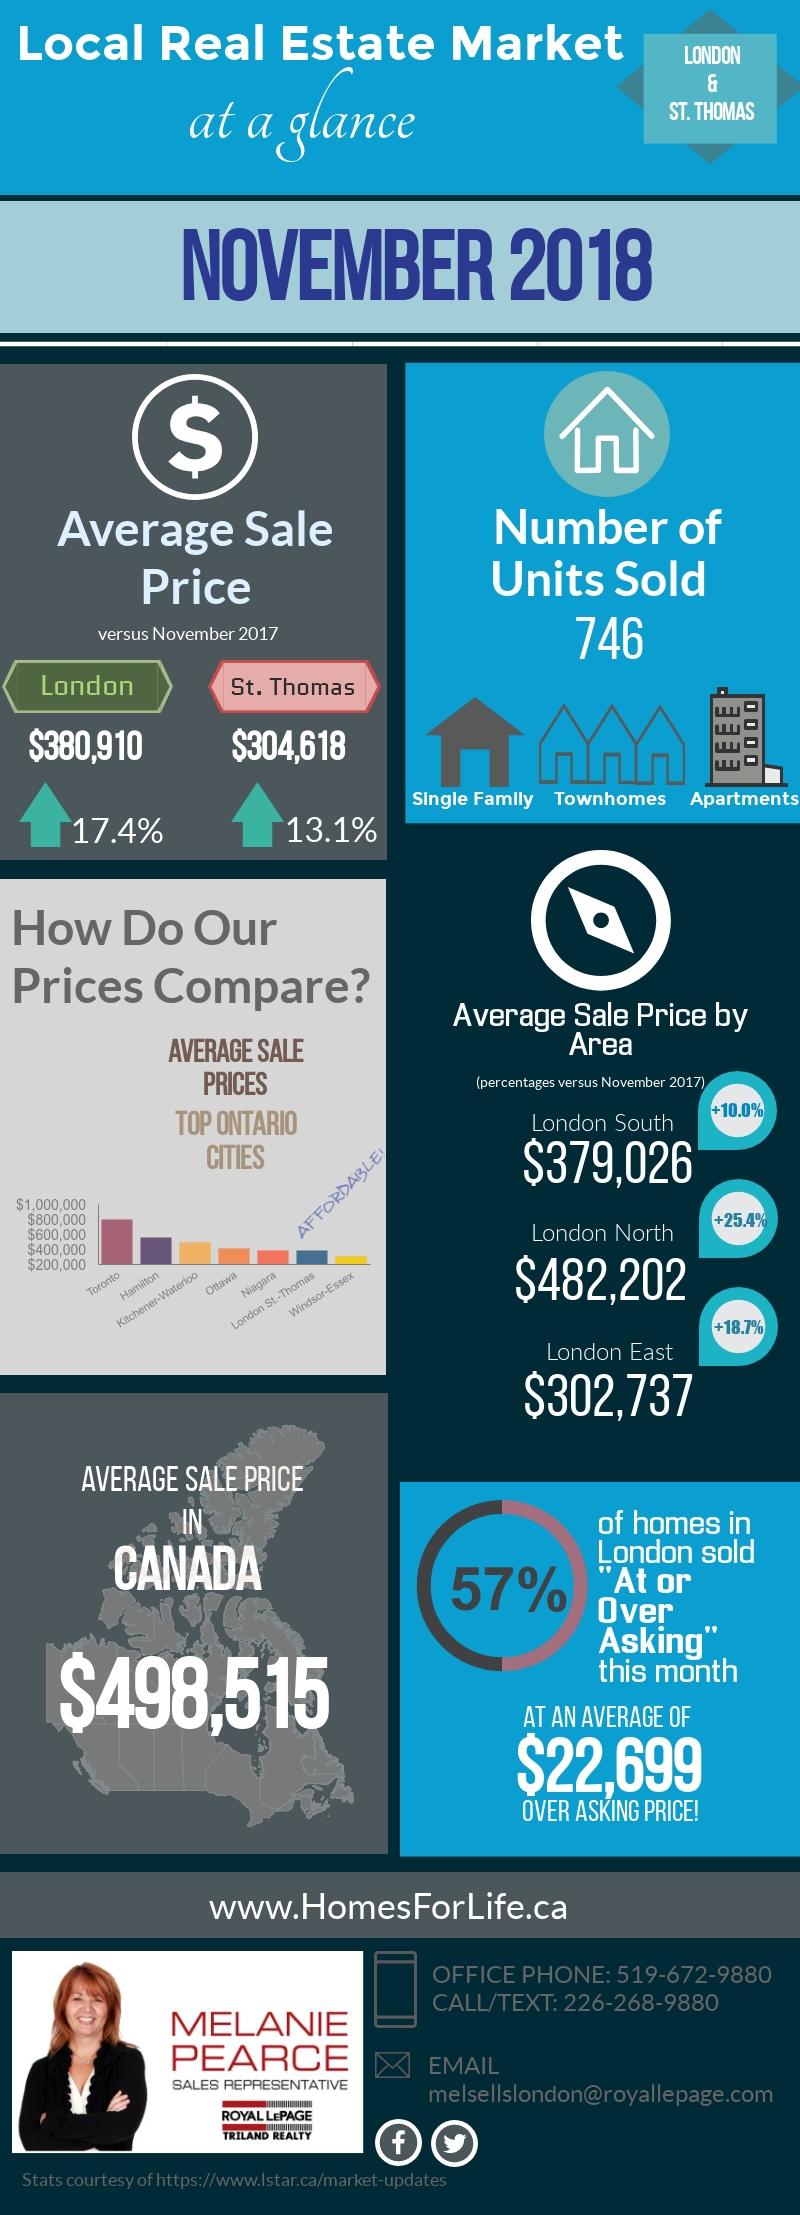 London-Ontario-Real-Estate-Market-Stats-November-2018.jpg